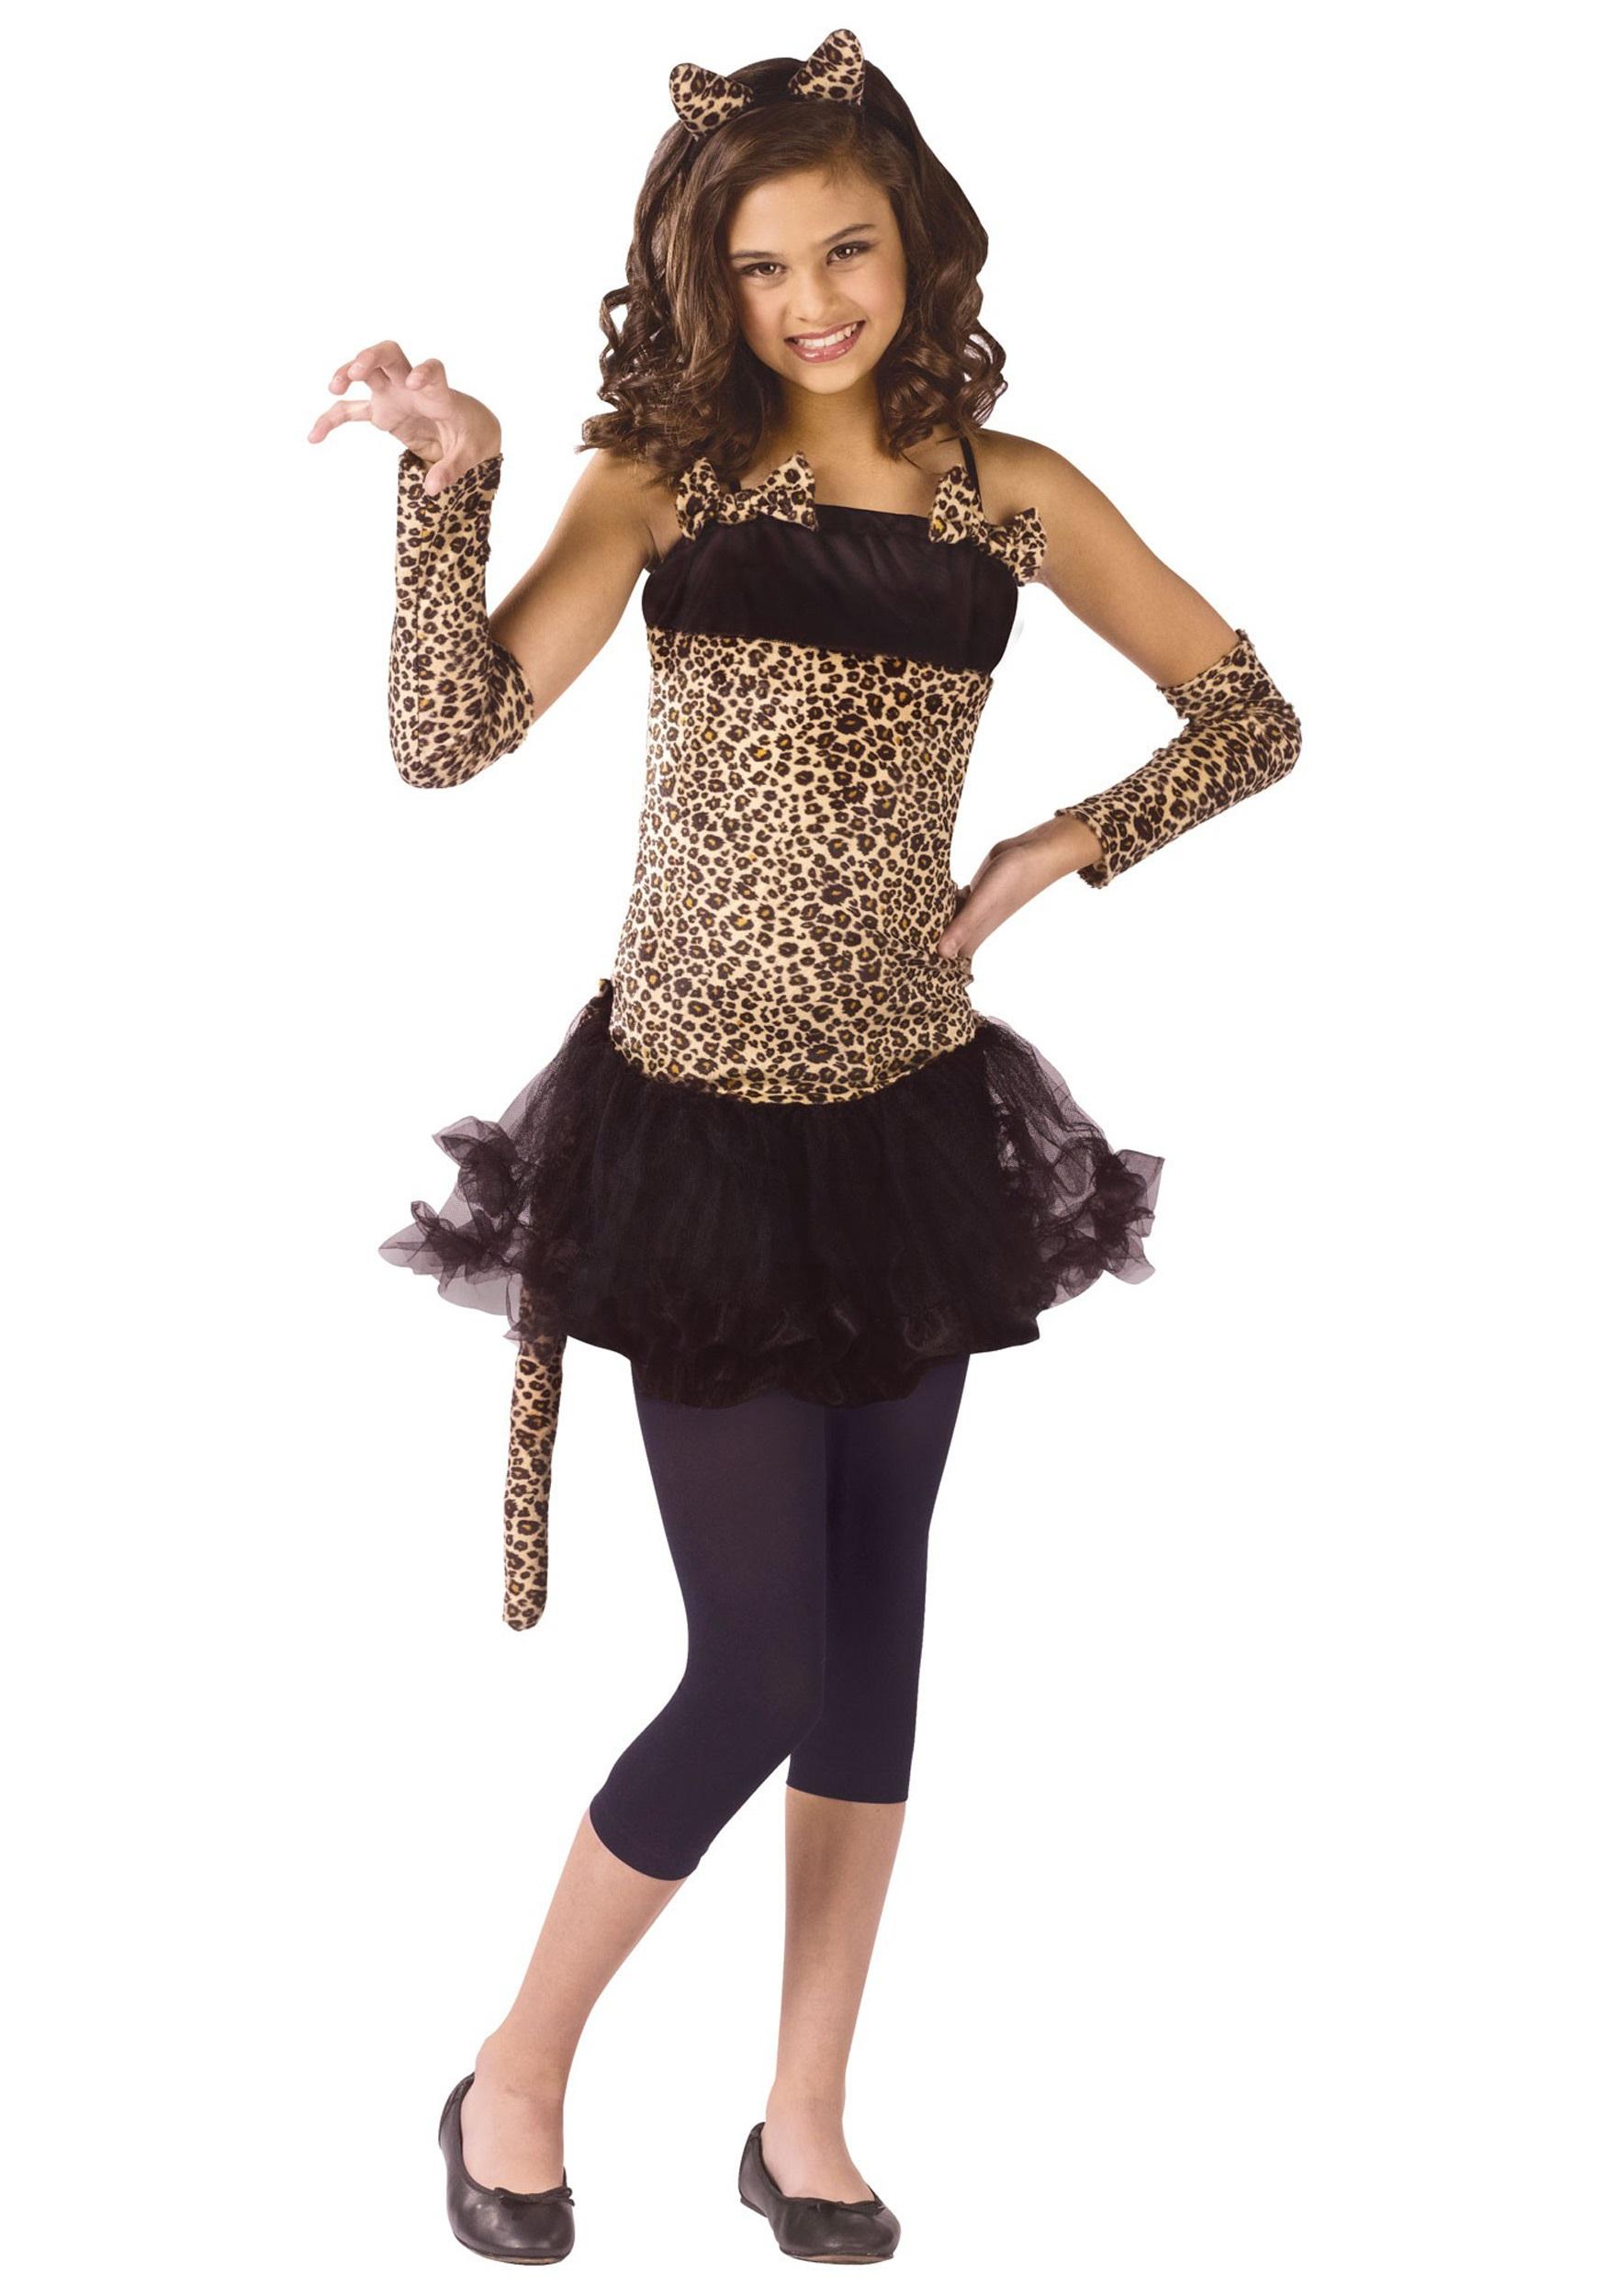 Child Wild Cat Costume  sc 1 st  Halloween Costumes & Child Wild Cat Costume - Halloween Costumes